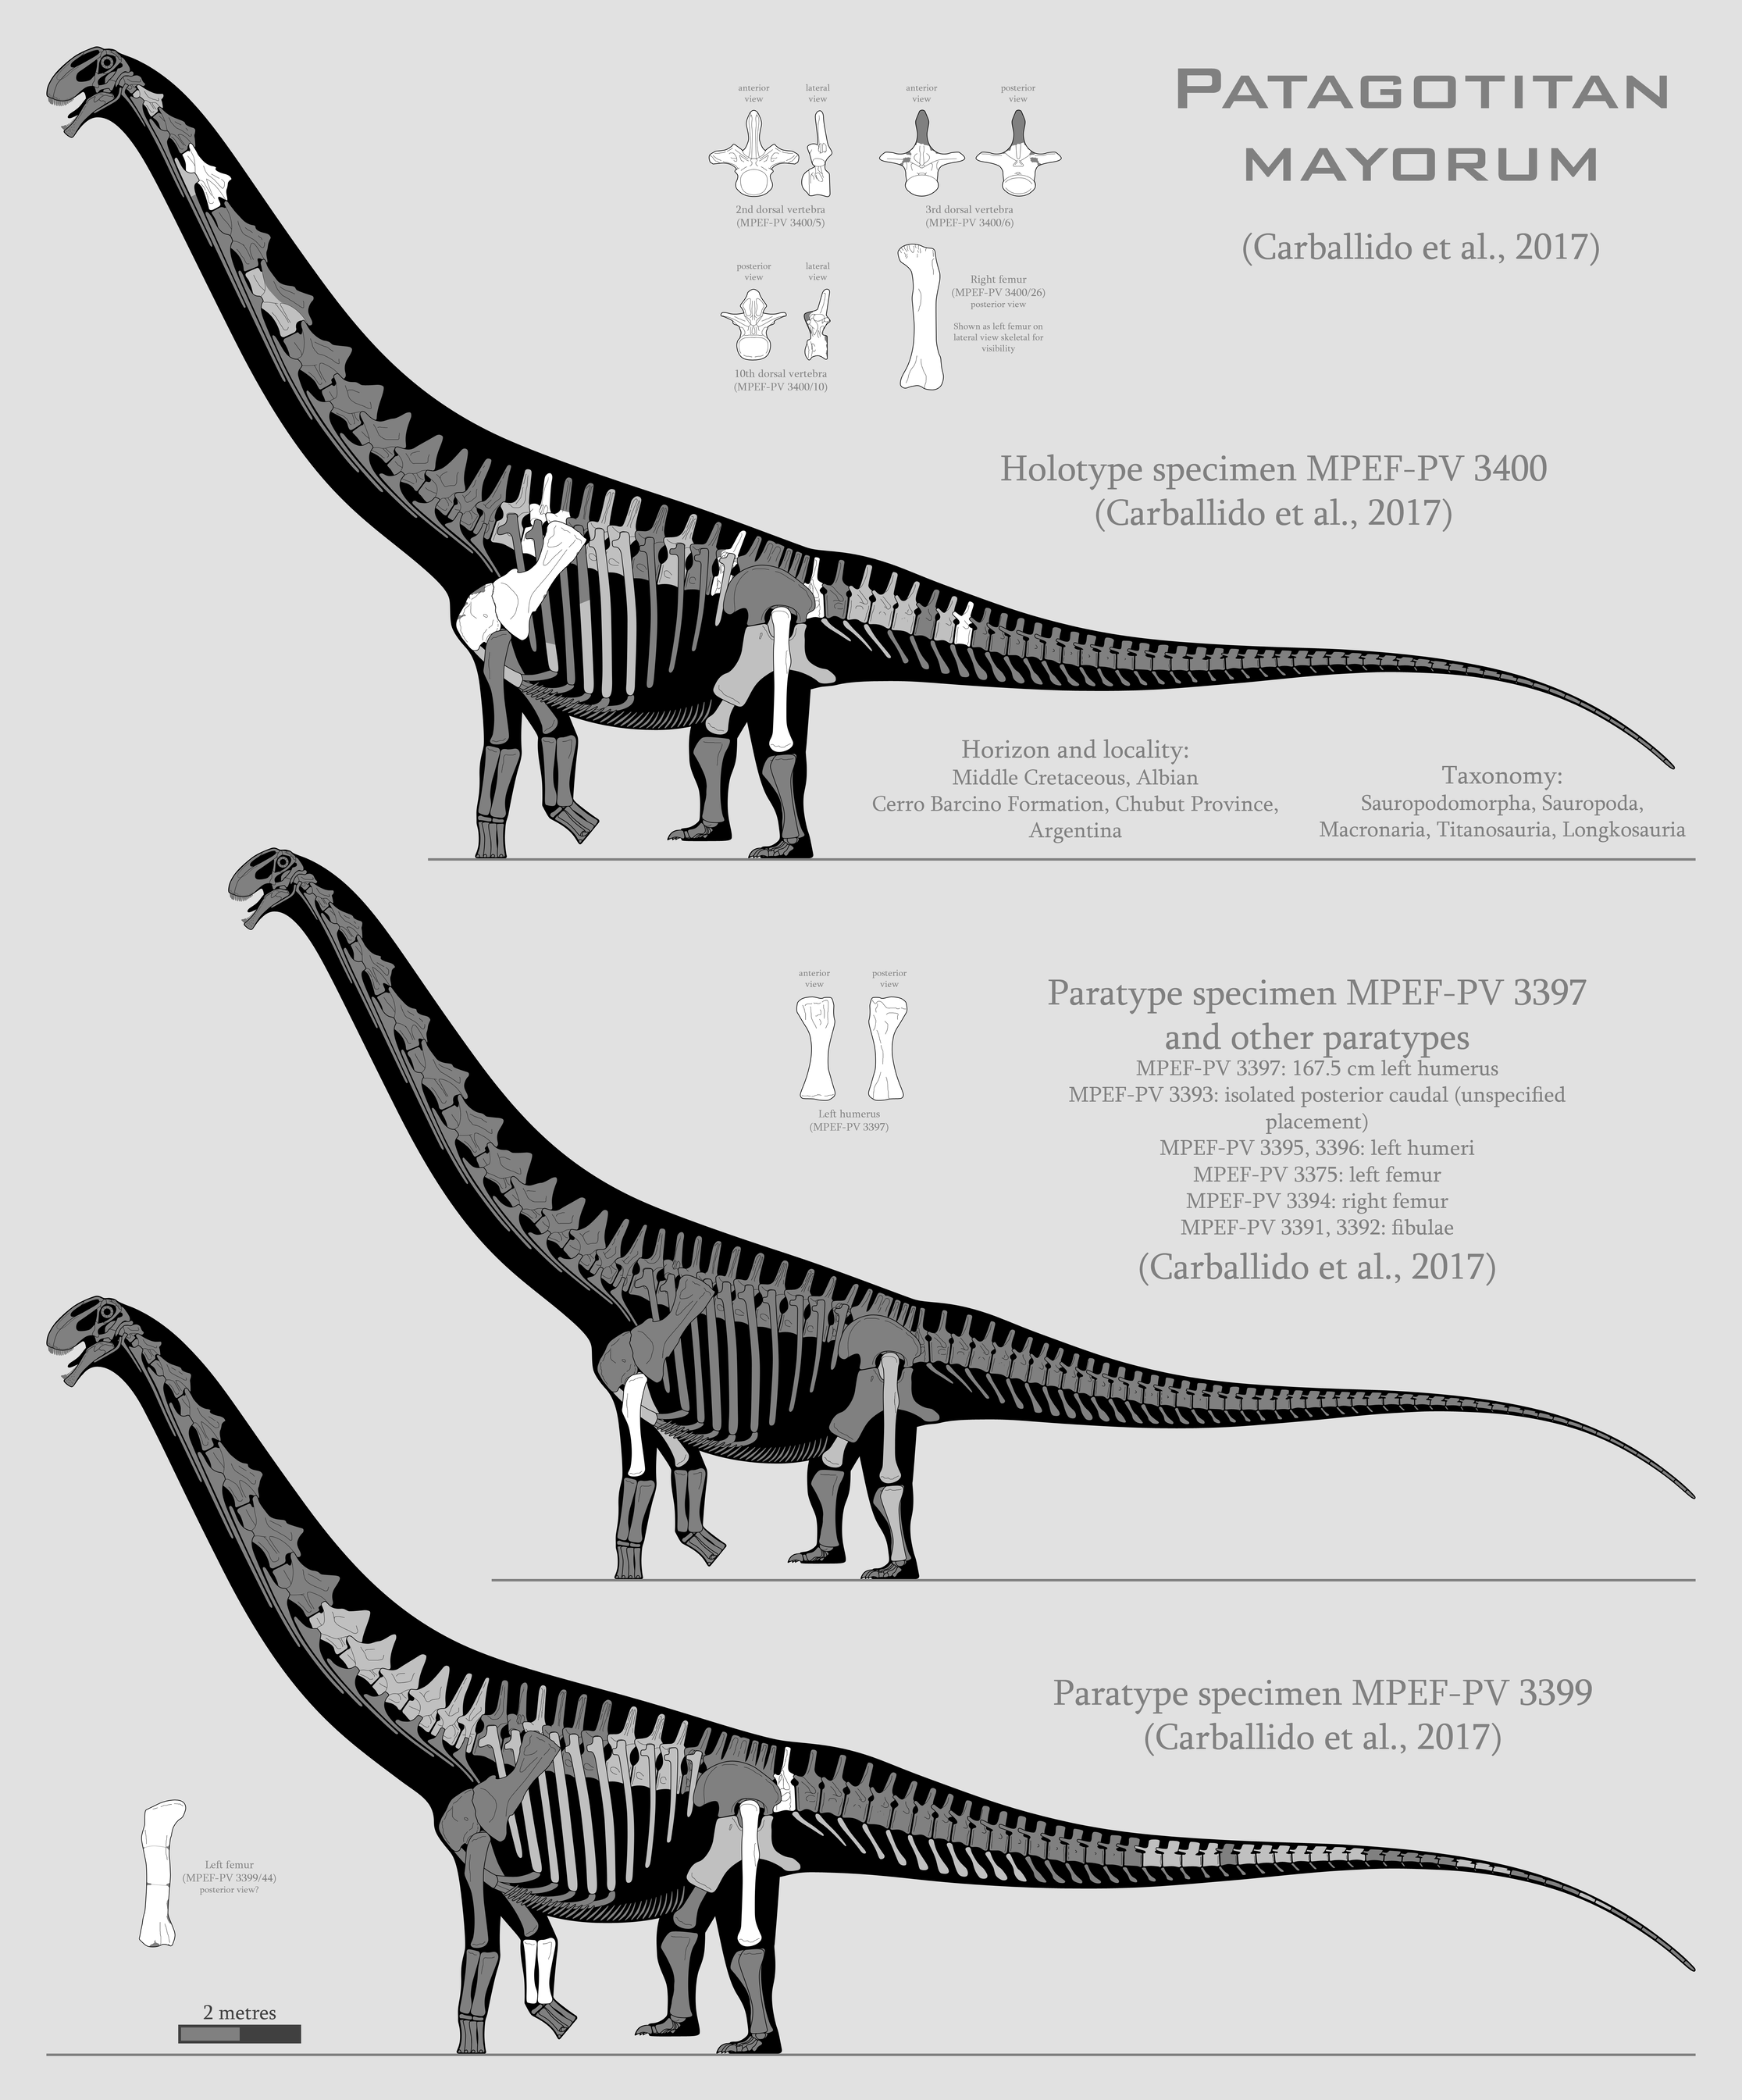 Patagotitan mayorum skeletal reconstructions by SpinoInWonderland